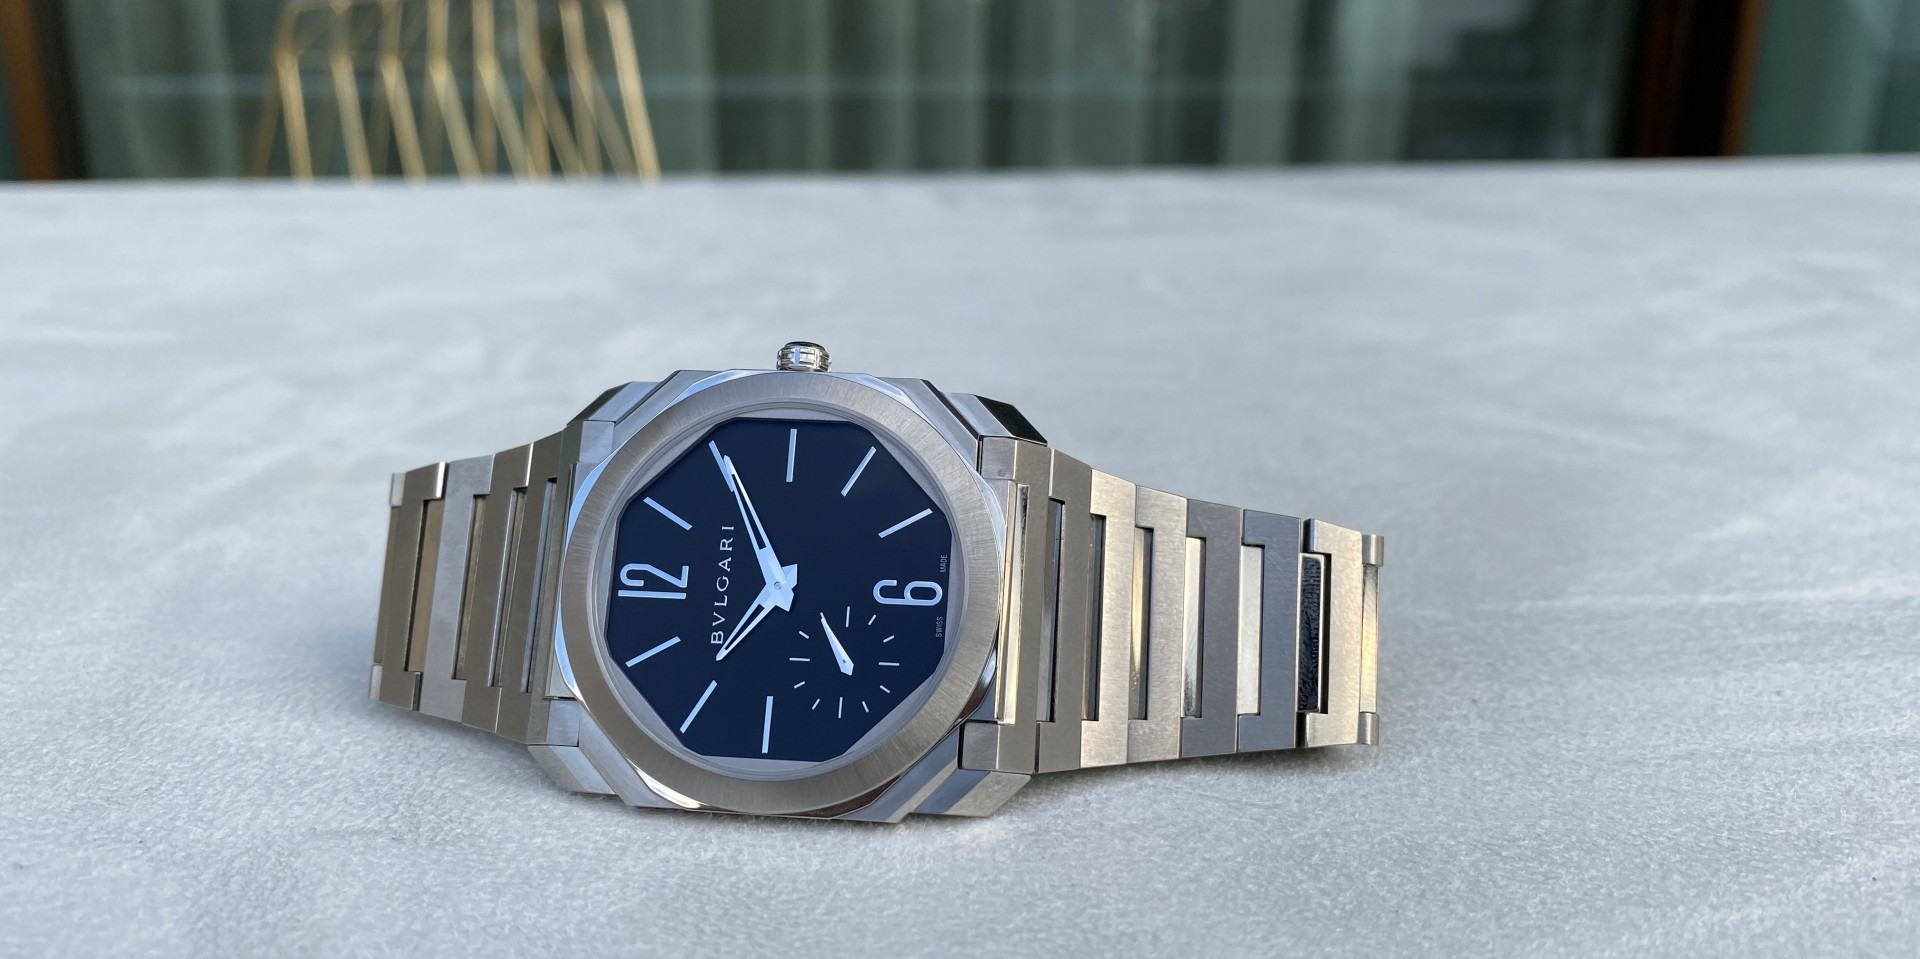 【LVMH Watch Week 2020錶展報導】BVLGARI OCTO FINISSIMO 超薄系列持續突破製錶框架,締造新傳奇